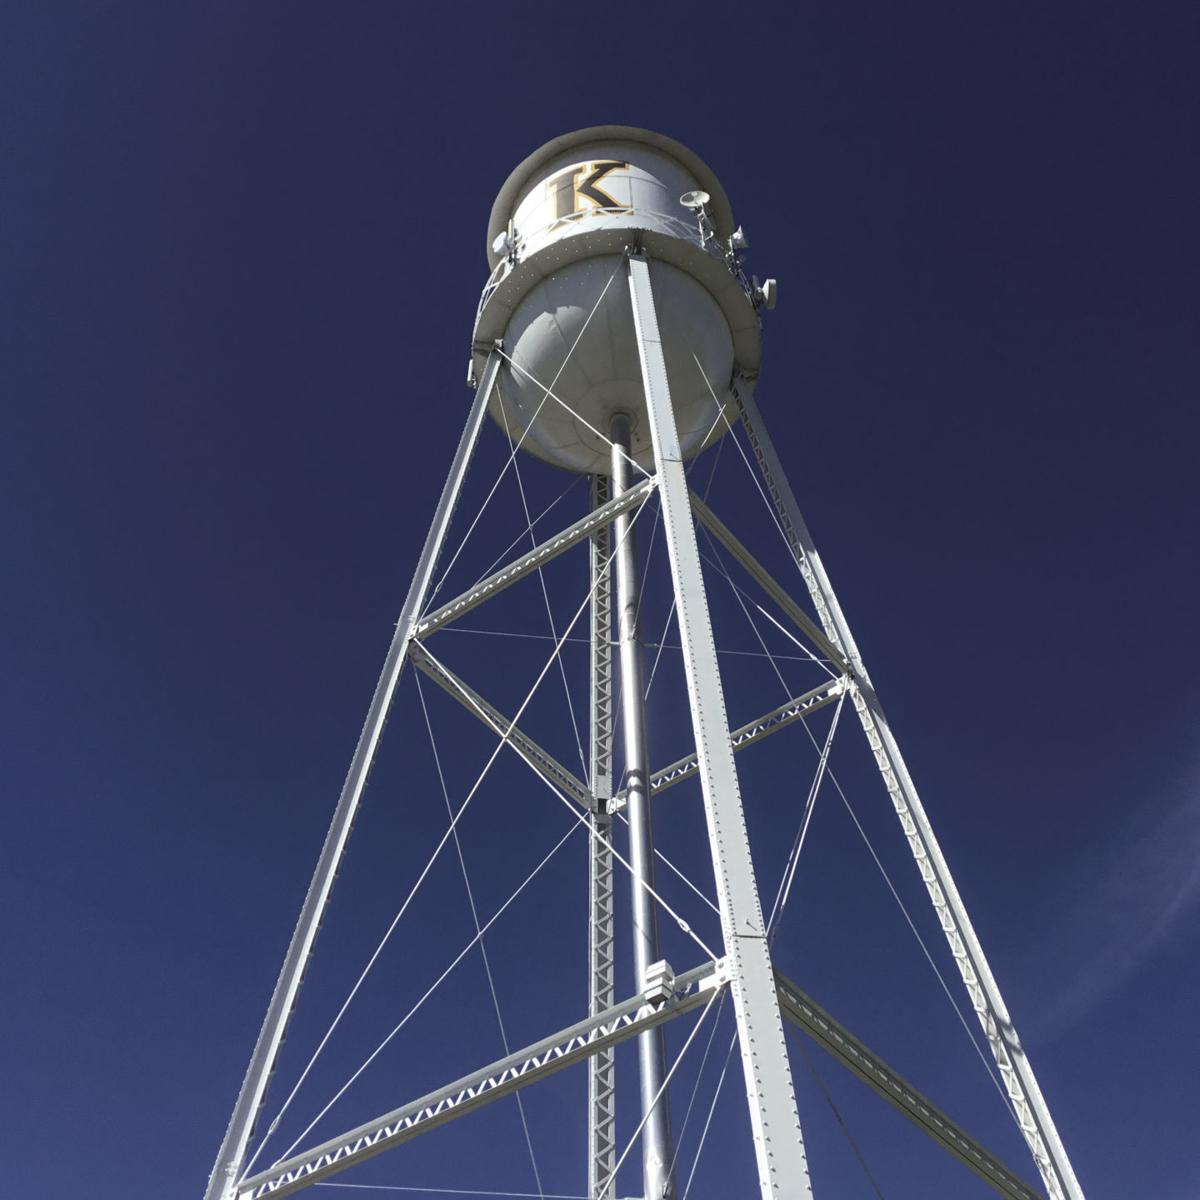 Skybox: Kuna water tower